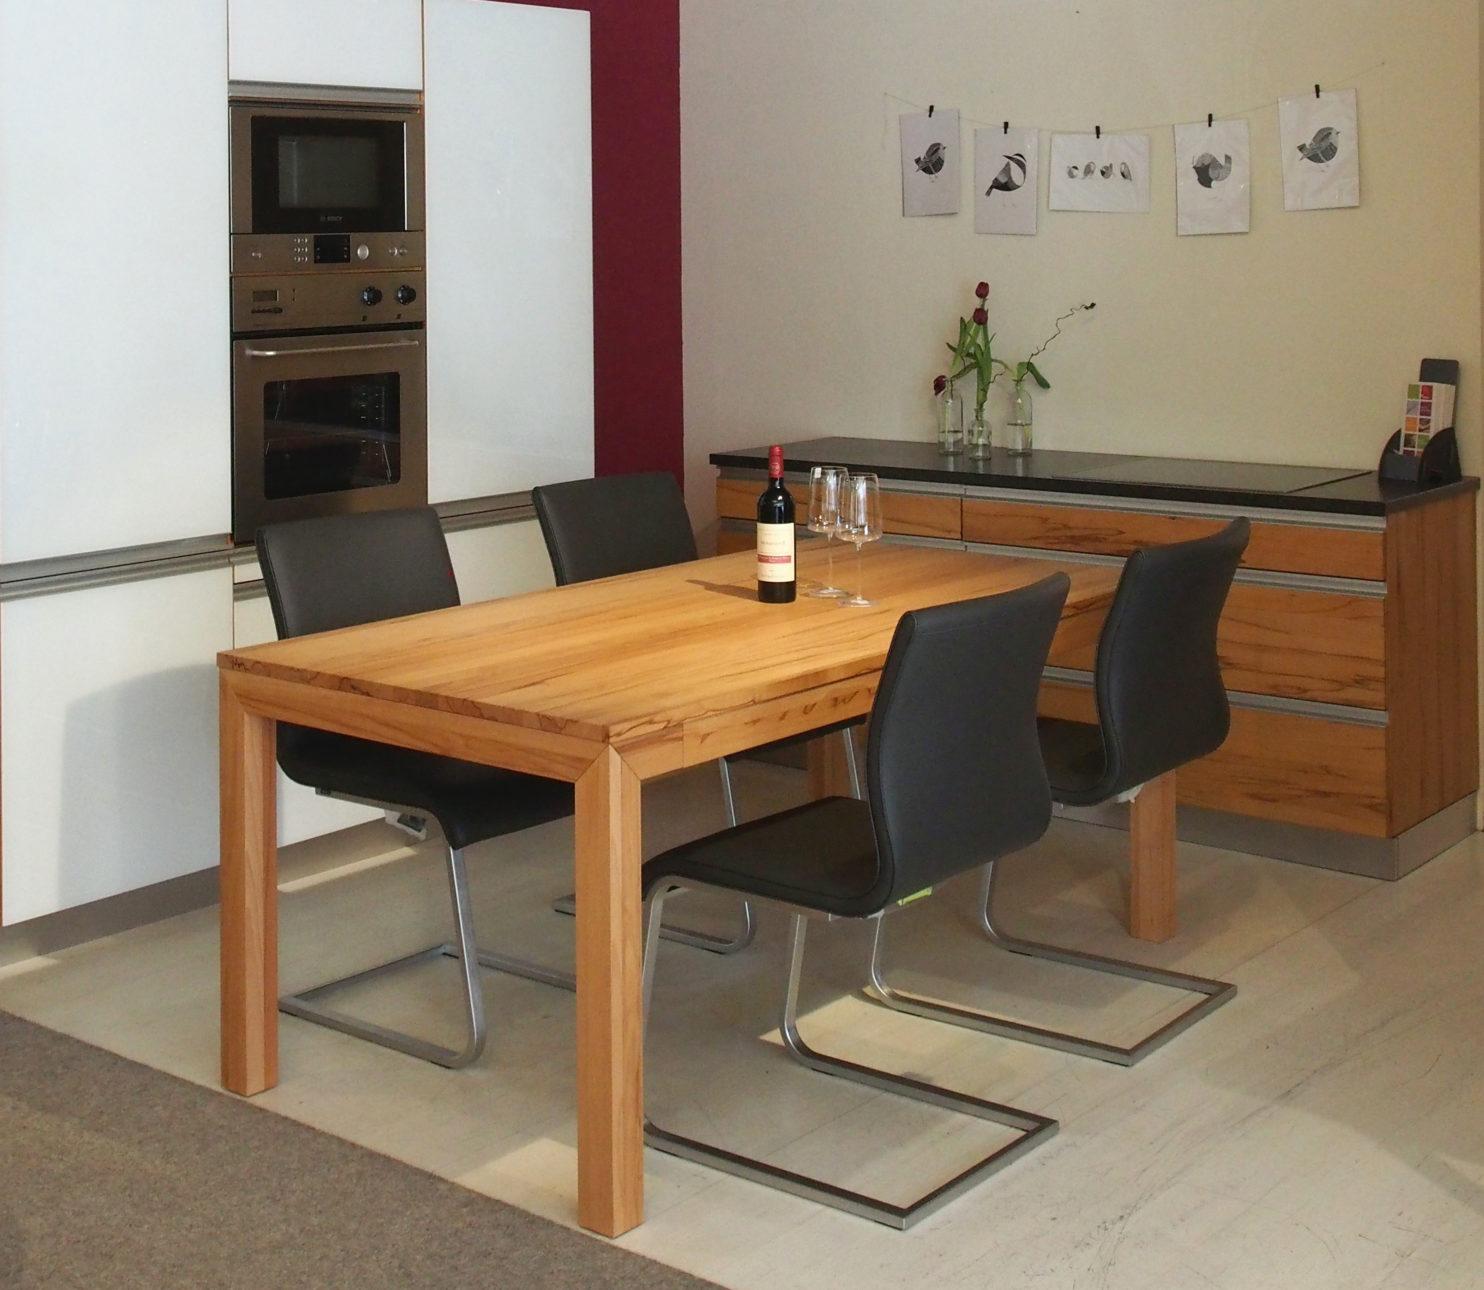 team7 produkt bersicht b hm natur darmstadt. Black Bedroom Furniture Sets. Home Design Ideas